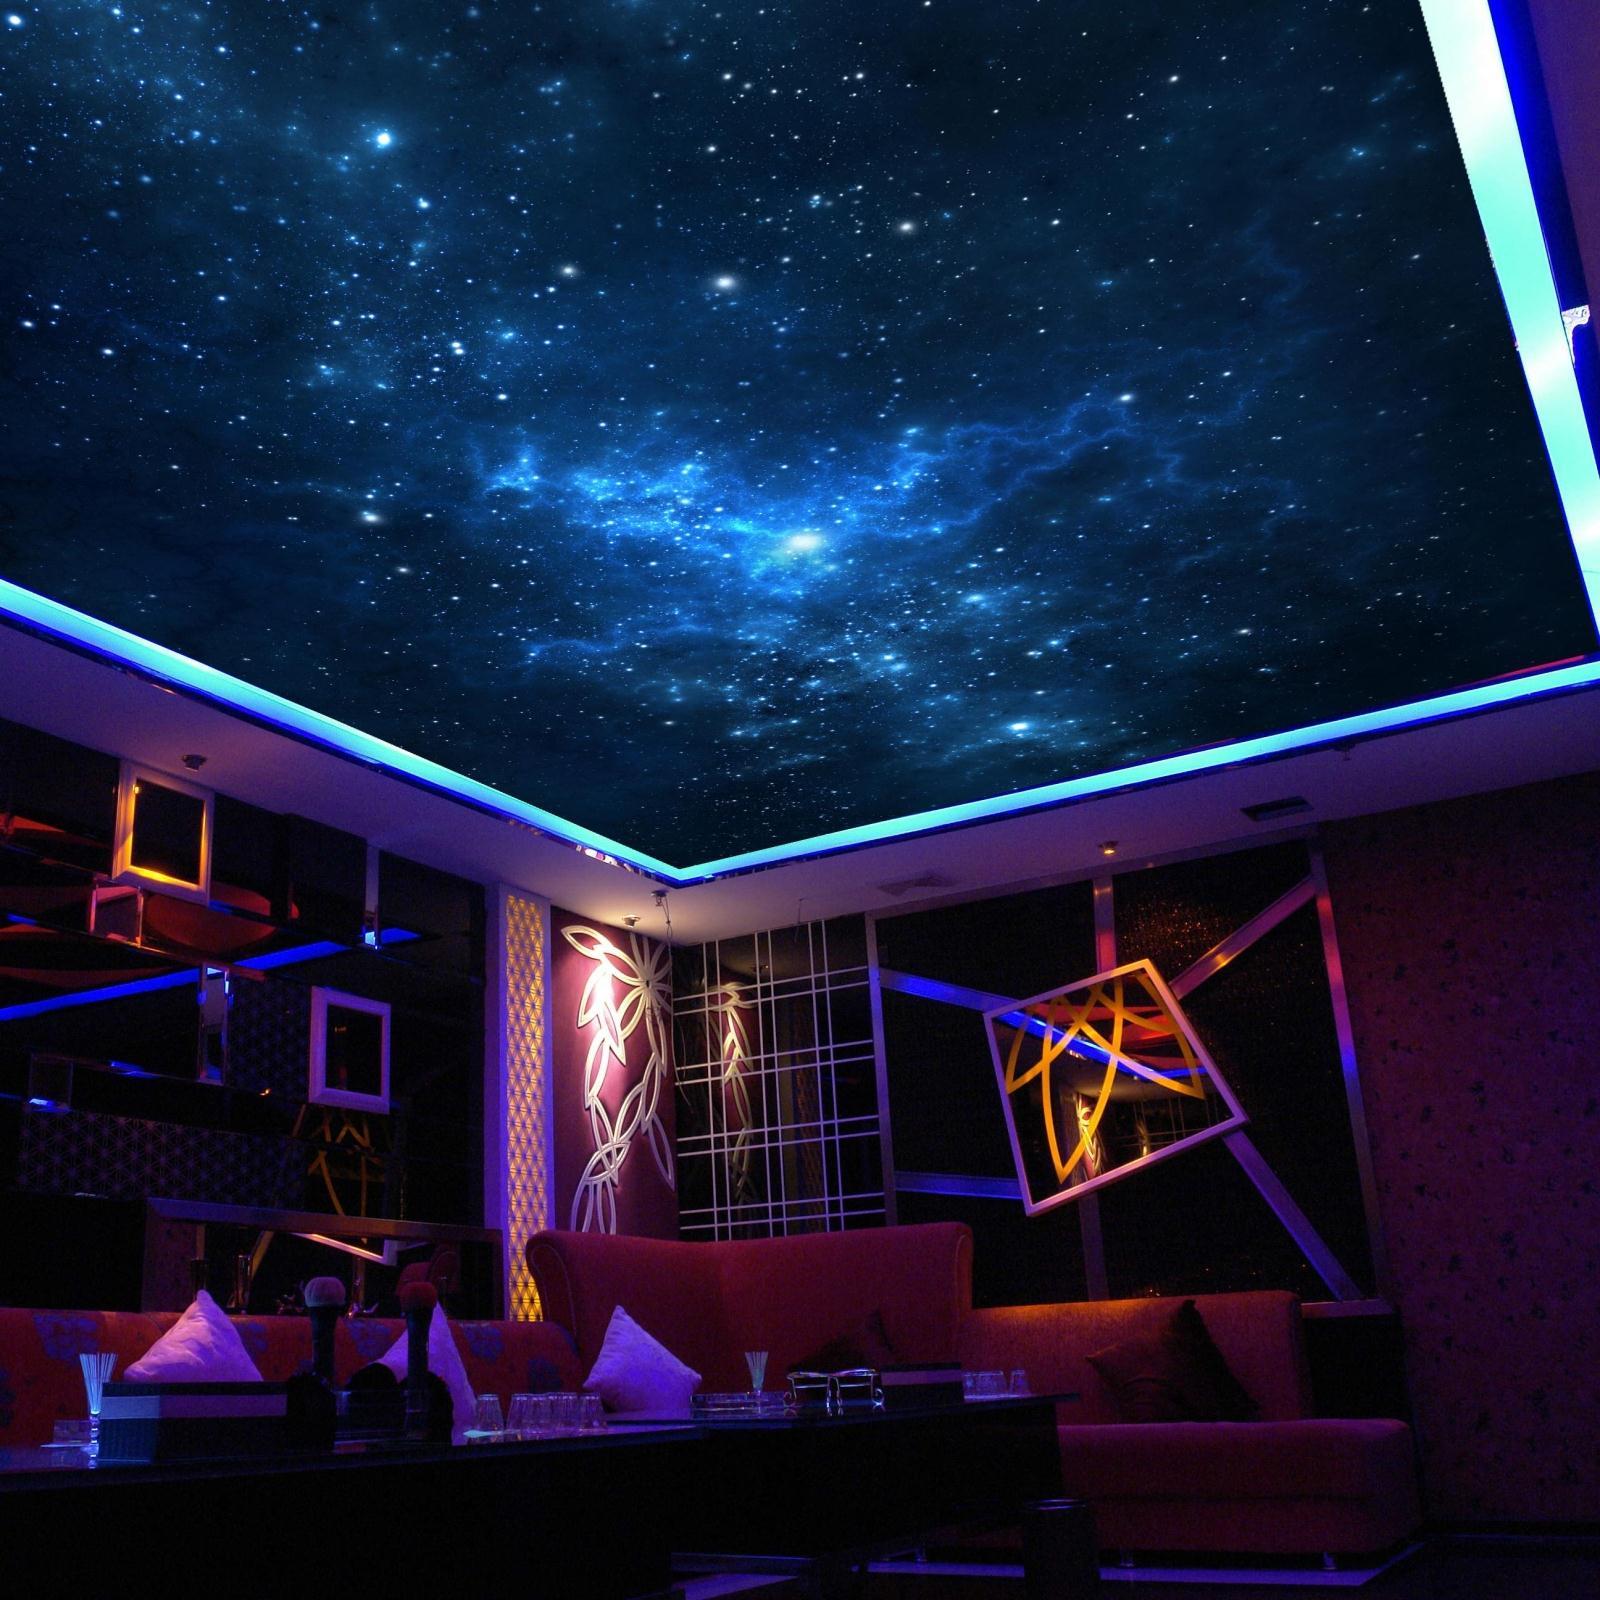 Fondos de pantalla del cielo nocturno compra lotes for Ceiling mural in a smoker s lounge